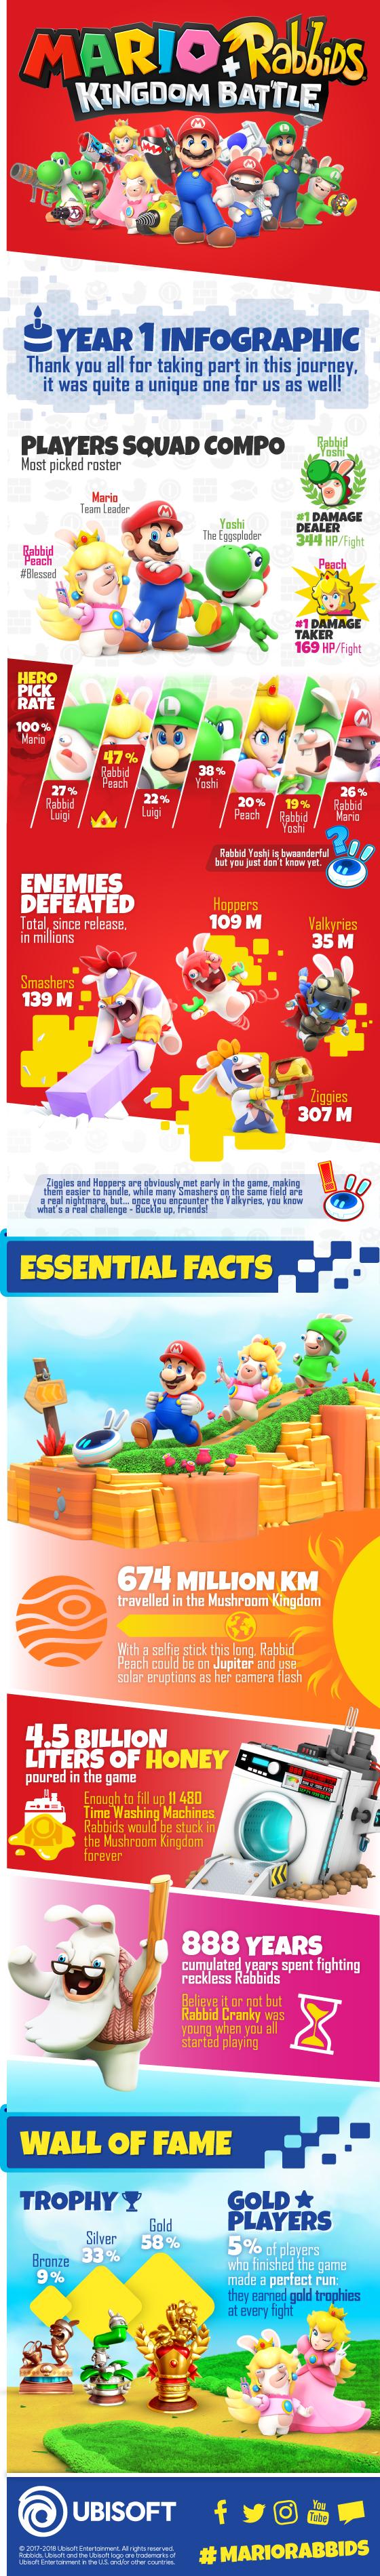 mario_rabbids_infographic